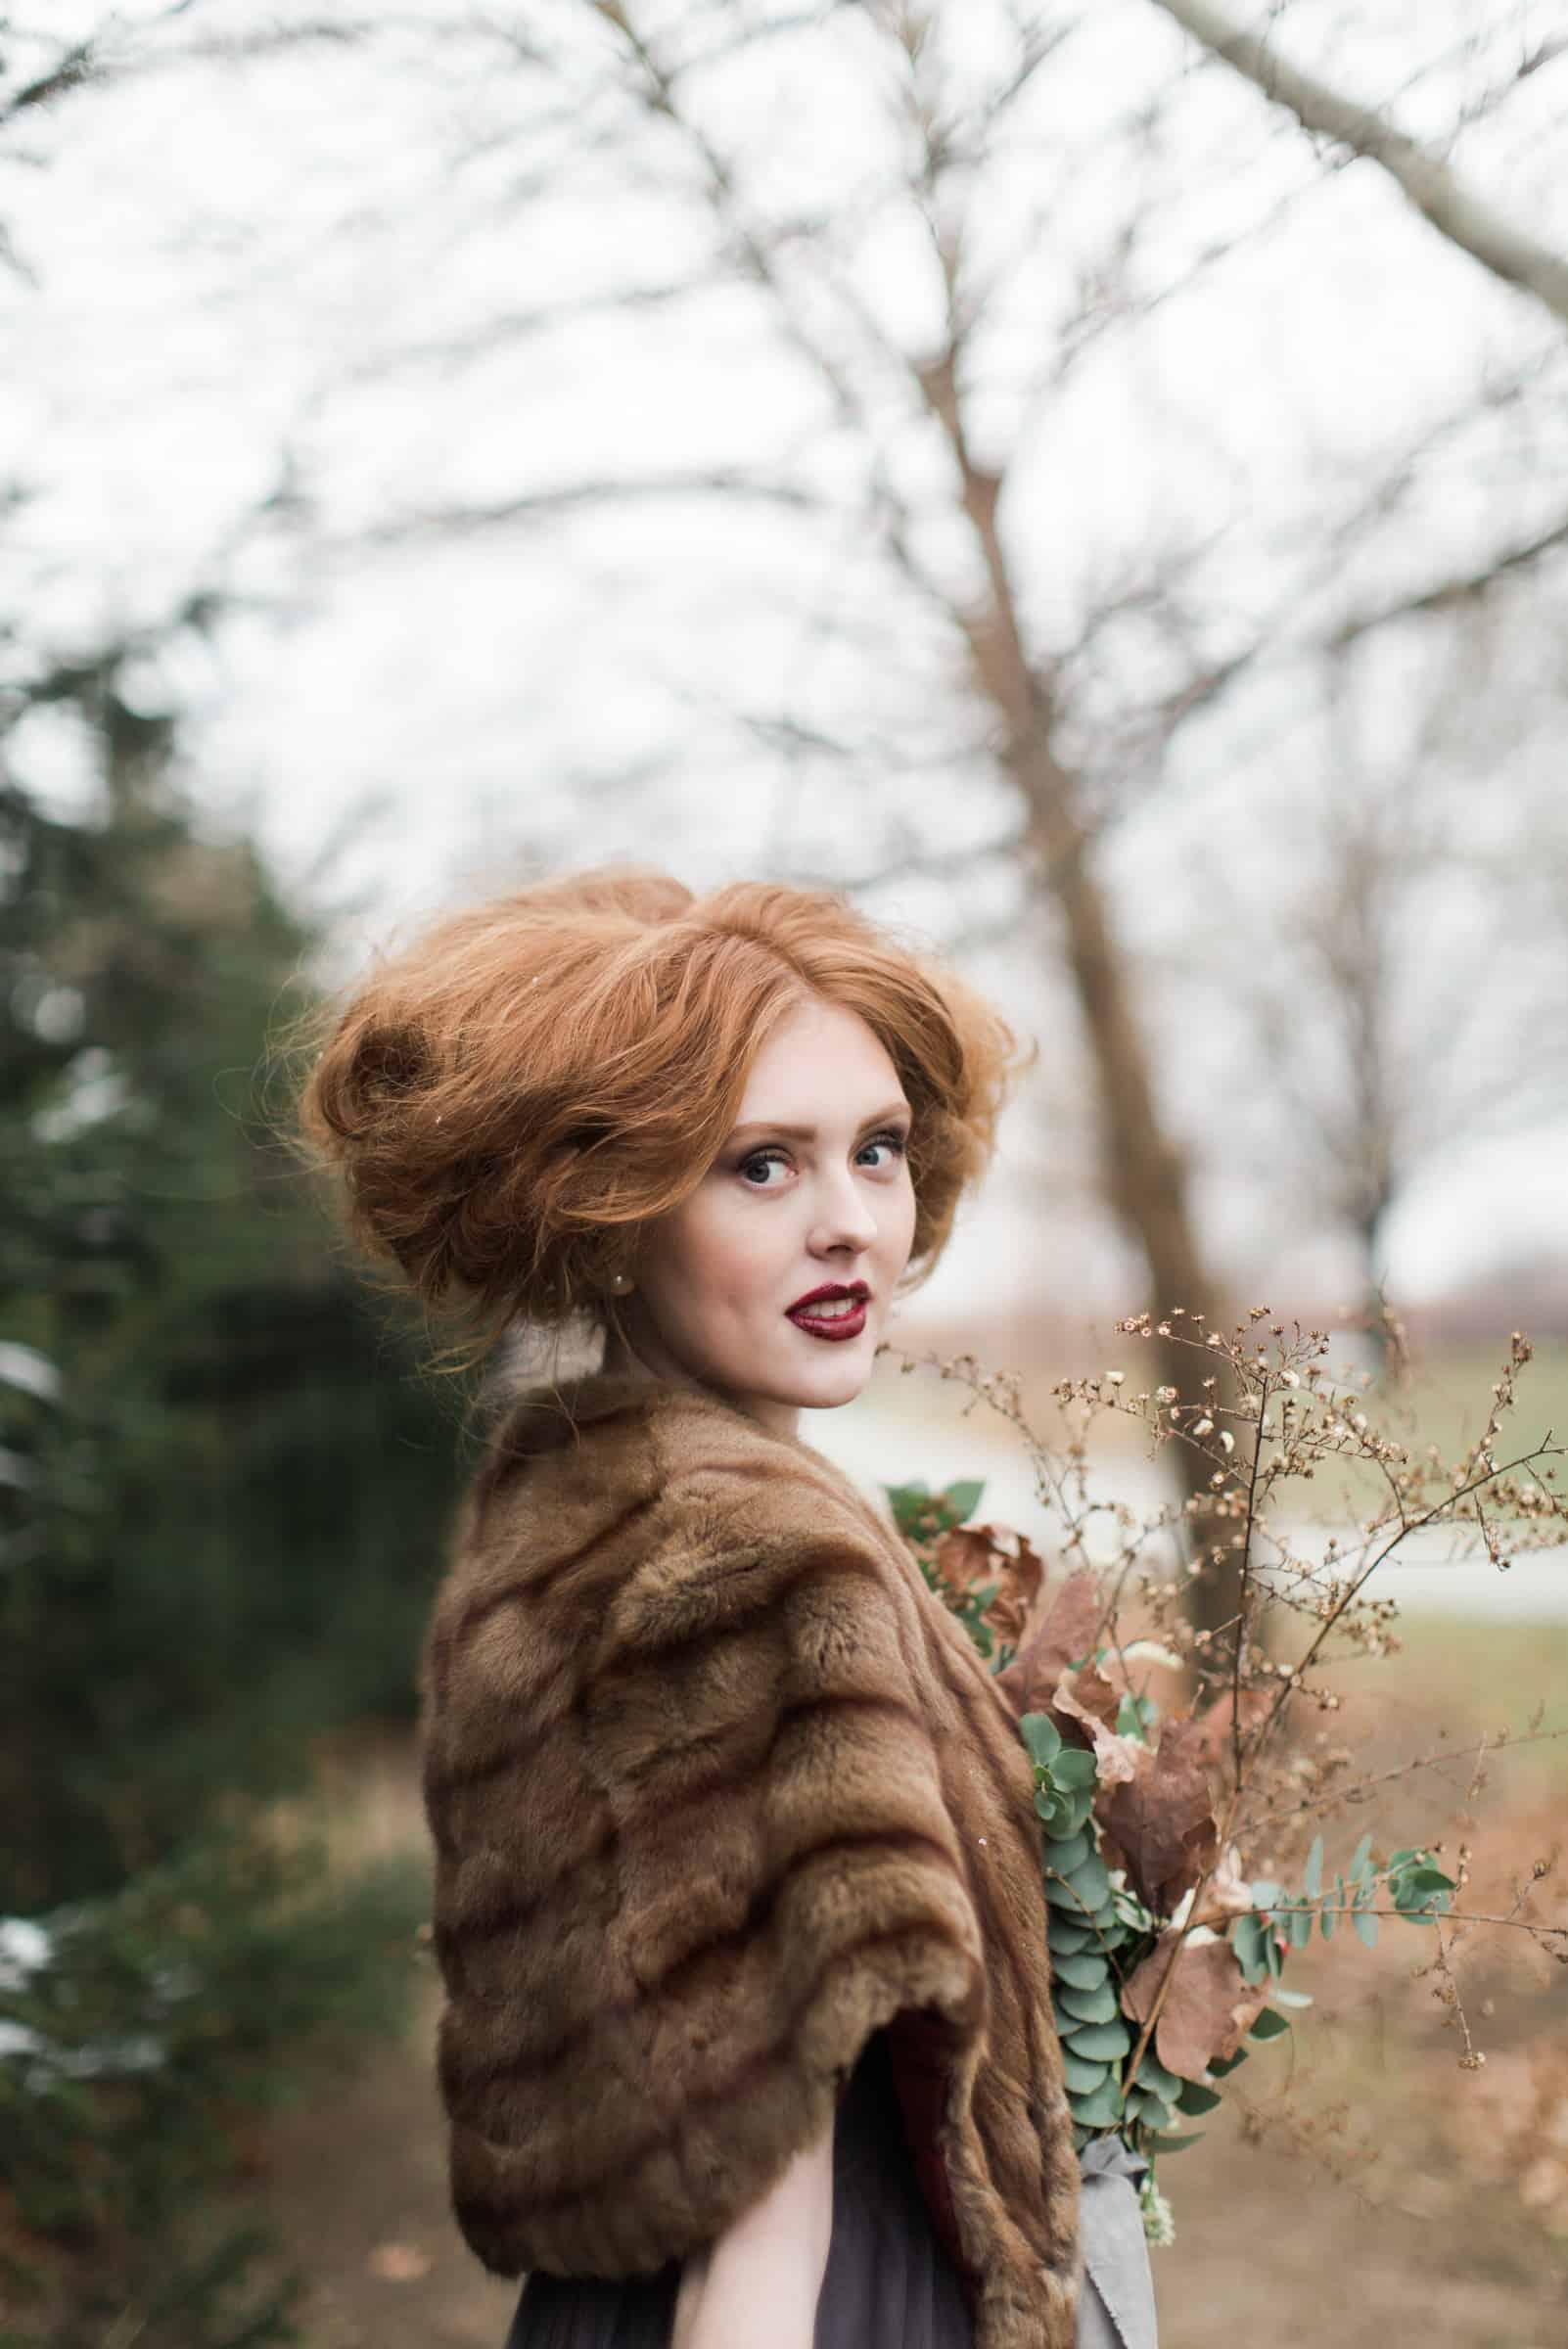 Winter Wedding | Styled Shoot